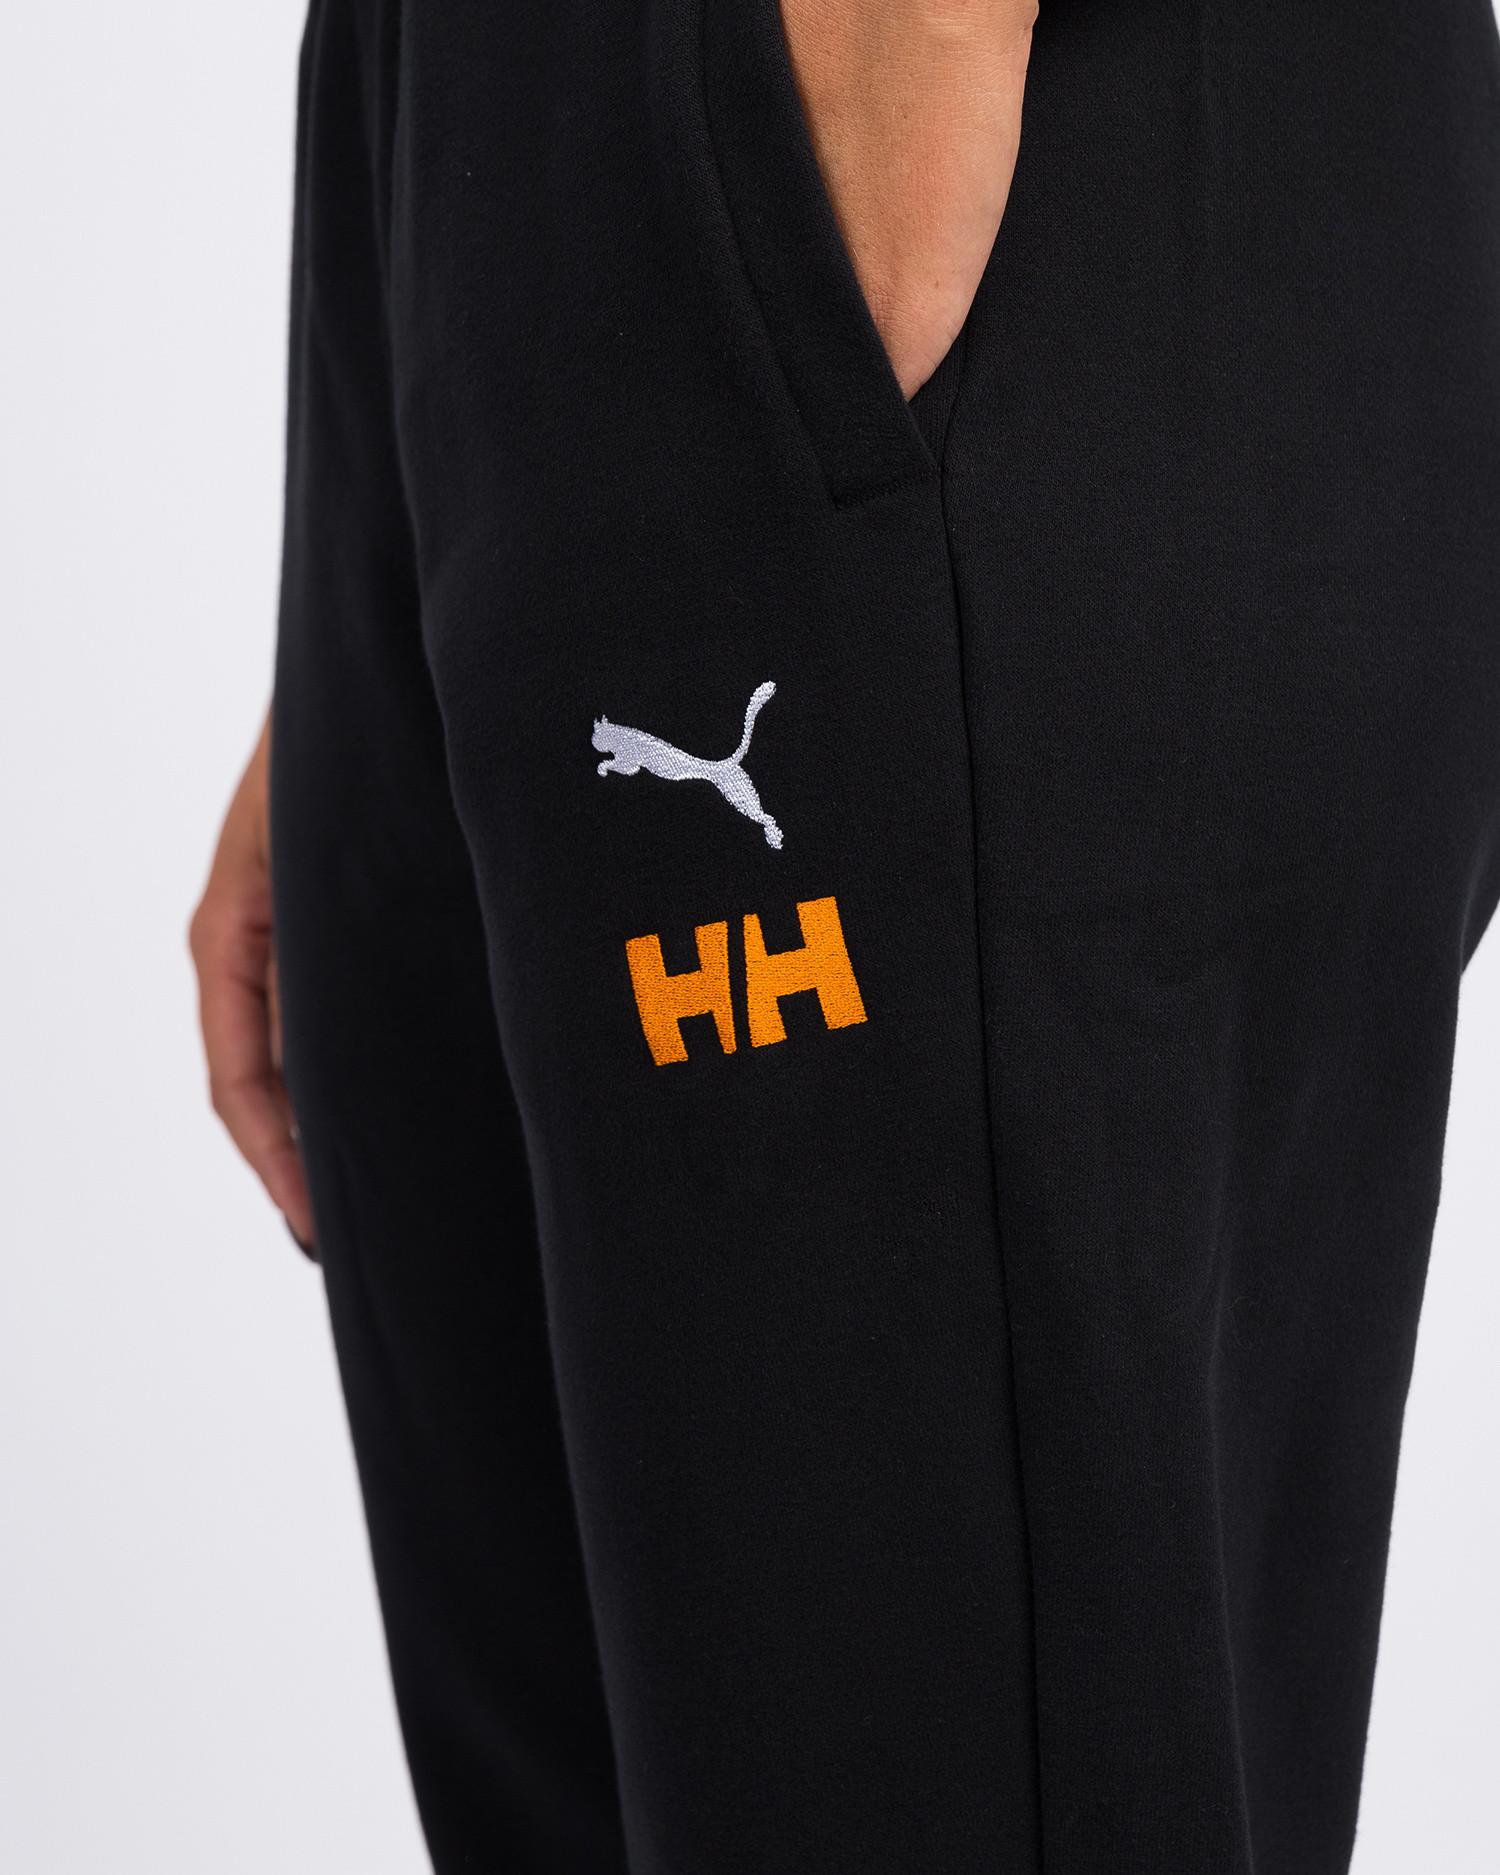 Puma X Helly Hansen Fleece Pant/Puma Black